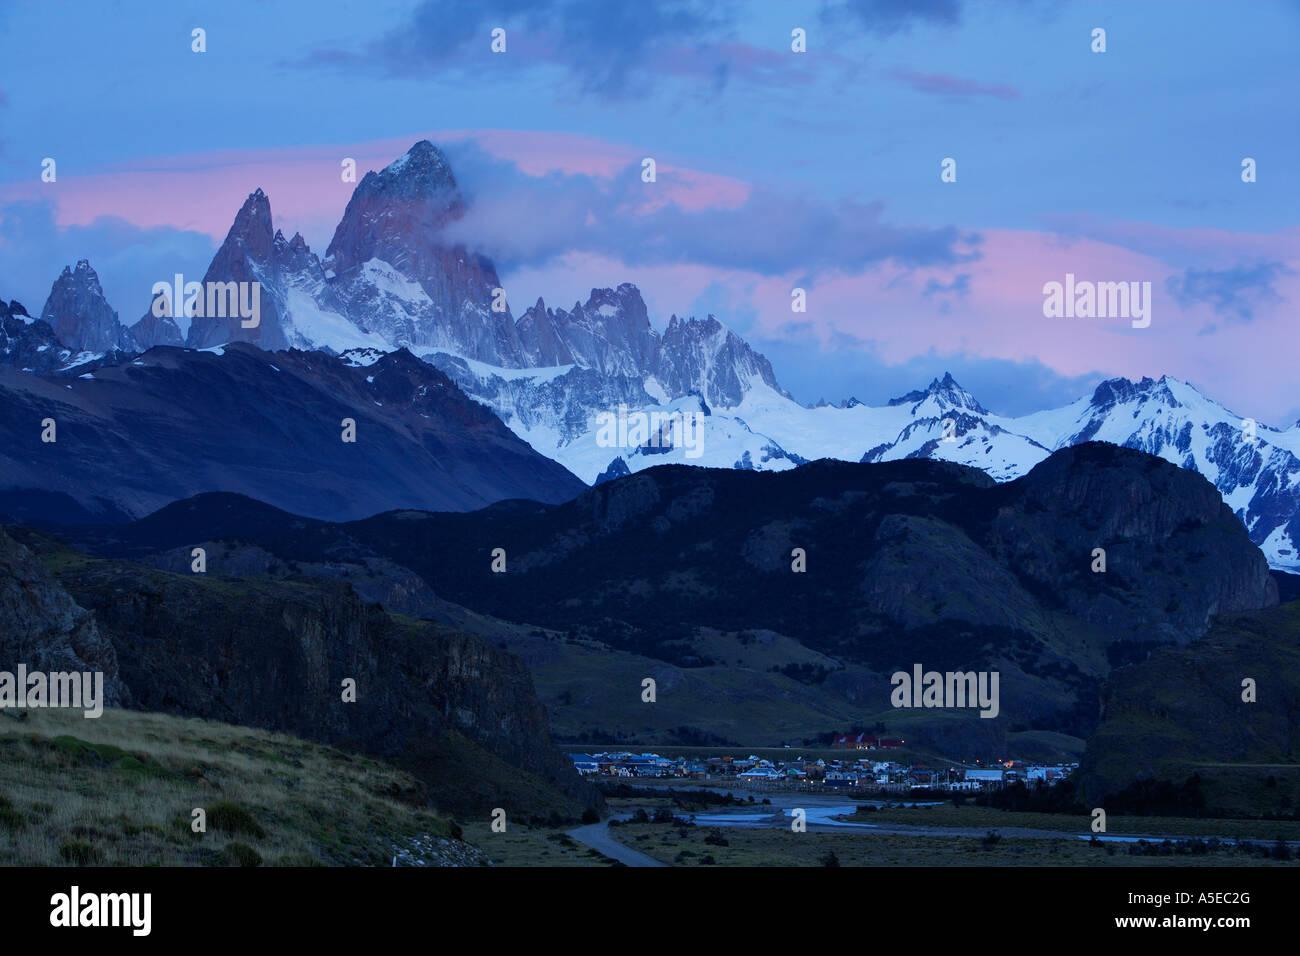 Chalten town below Cerro Fitz Roy or Chalten peak 3405 meters Los Glaciares National Park Patagonia Argentina - Stock Image